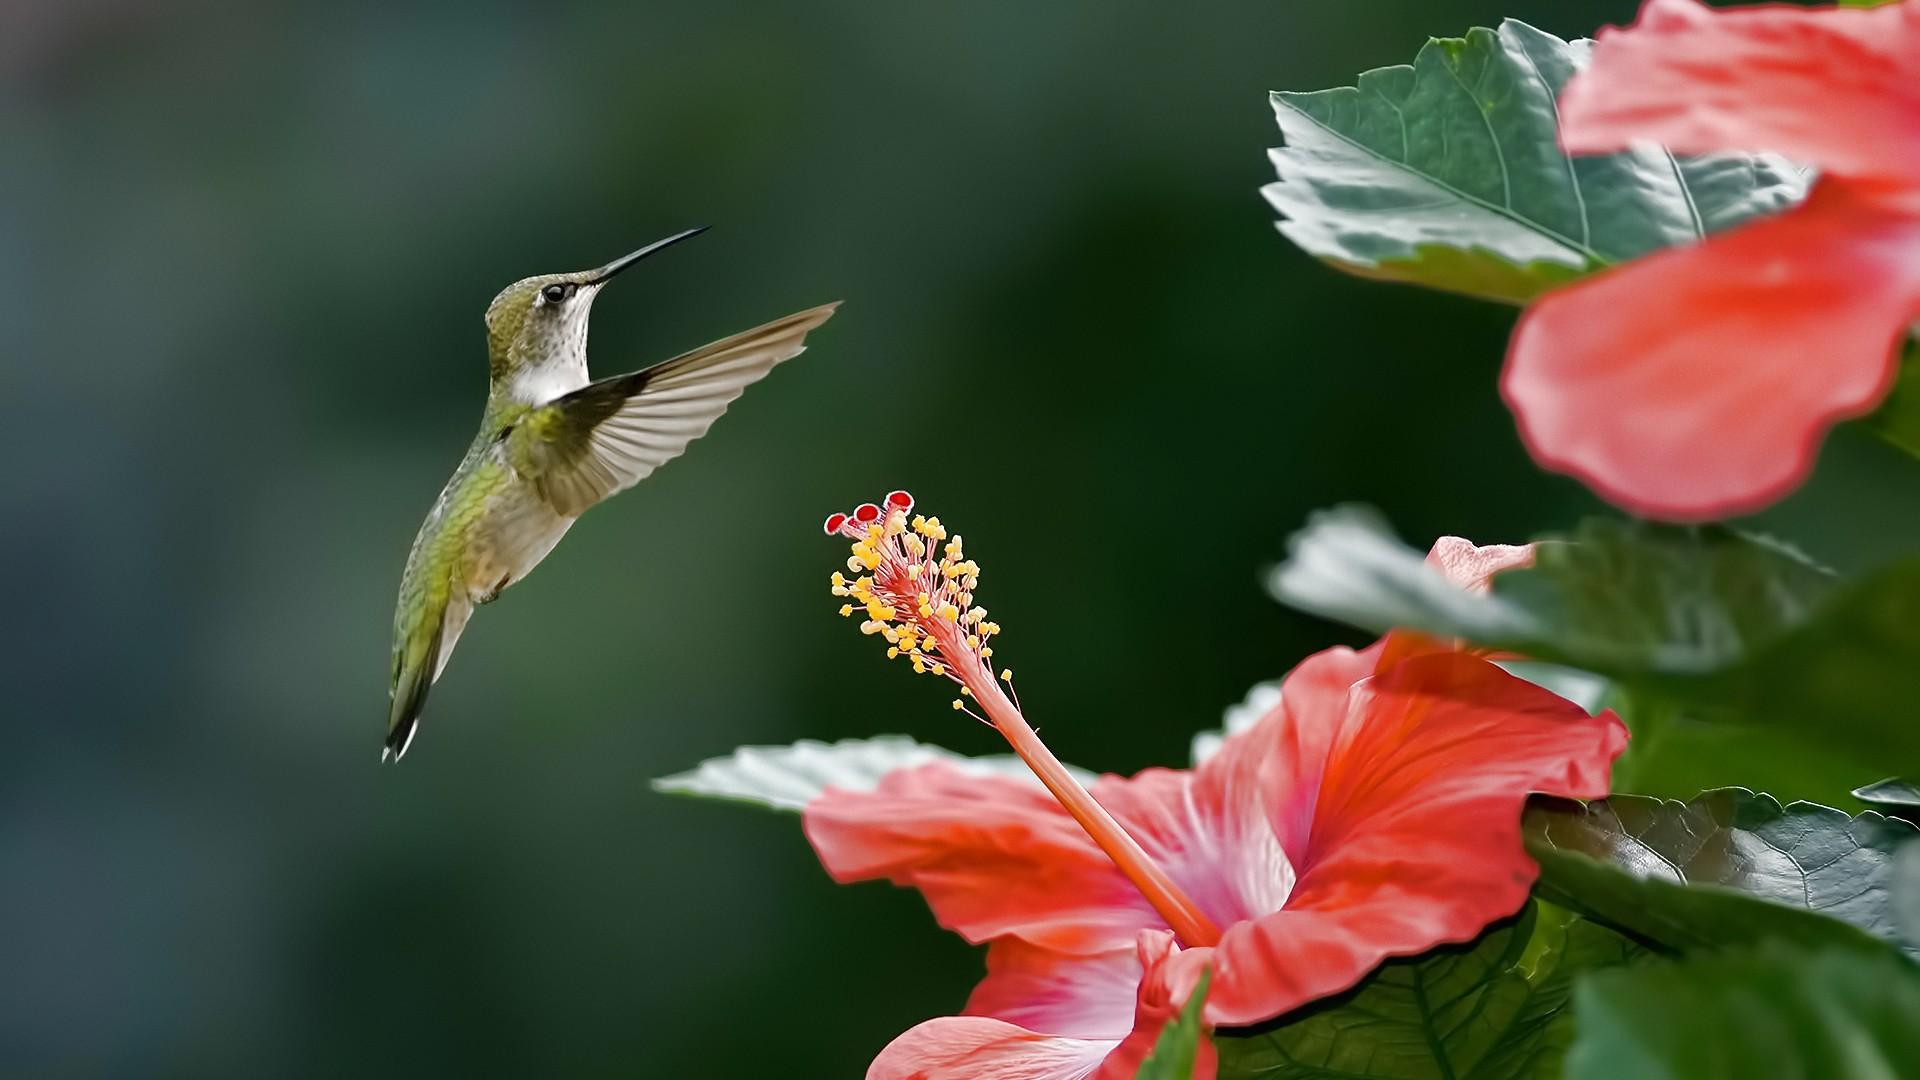 Hintergrundbilder Blumen Natur Kolibri Hibiskus Blatt Blume